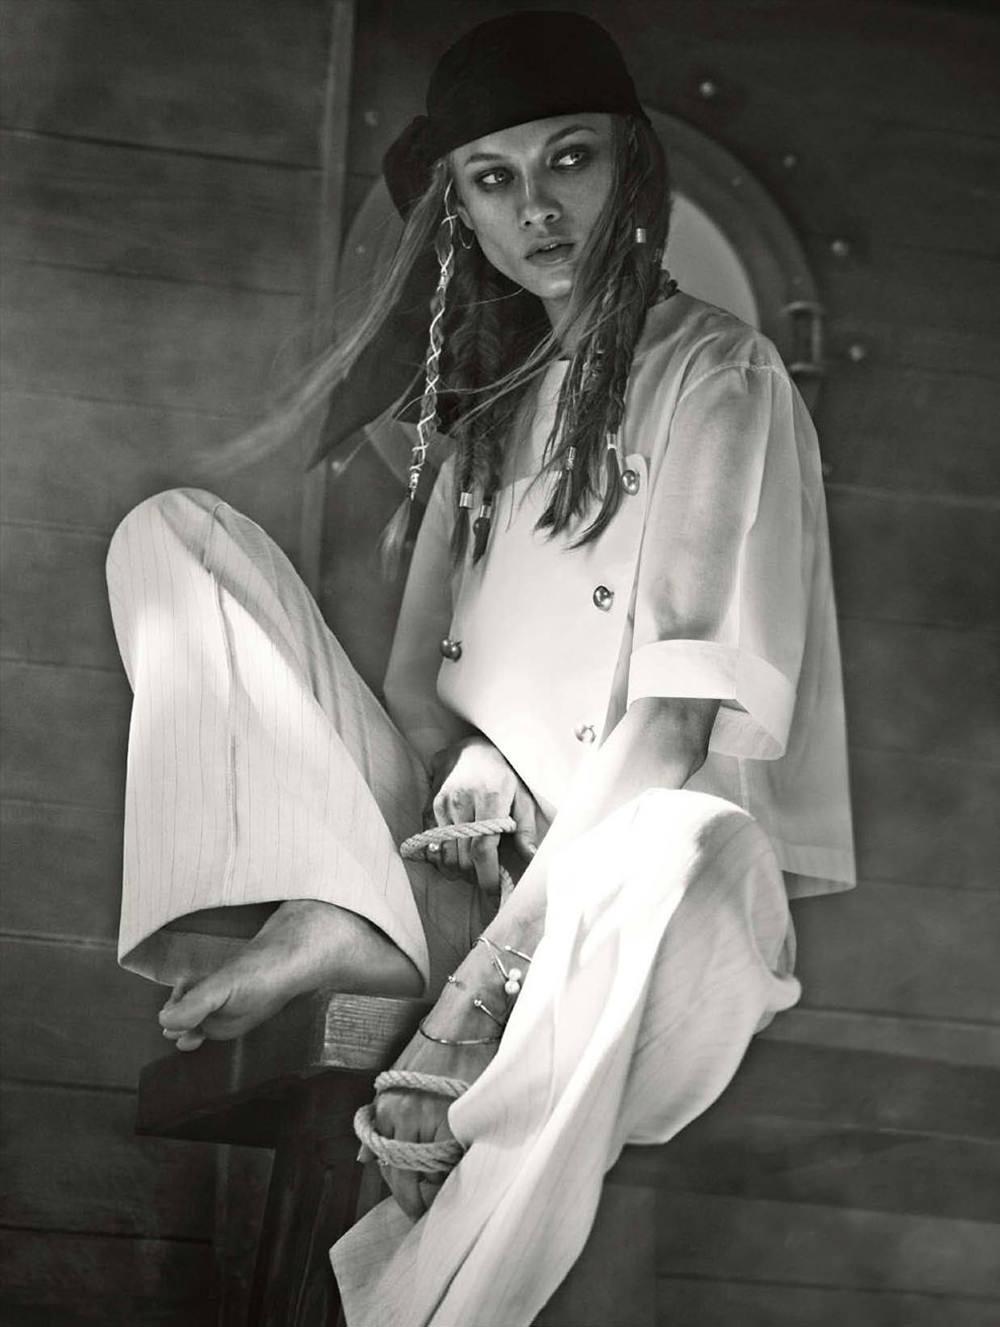 Anna-Selezneva-Anna-Selezneva-v-fotosessii-Princess-Charming-13-foto